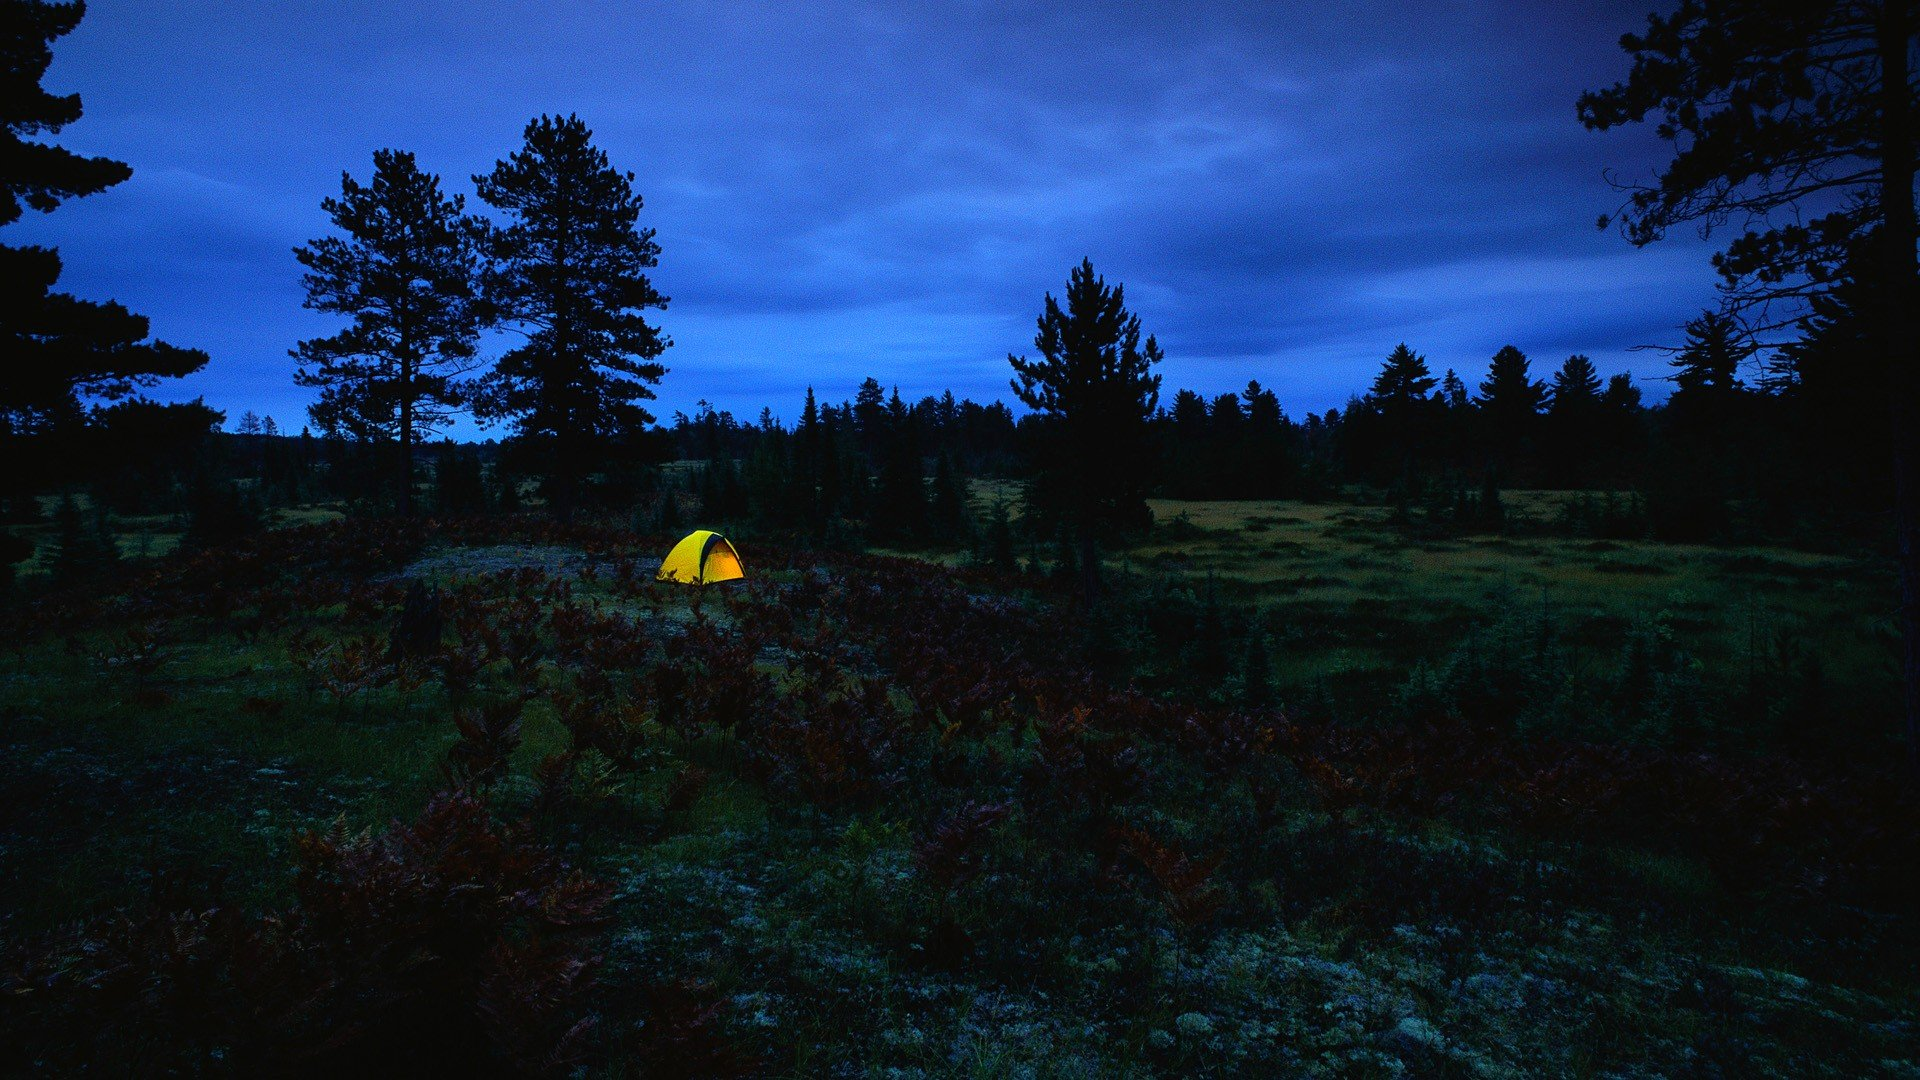 Full Screen Fall Wallpaper Camping Backgrounds Free Download Pixelstalk Net